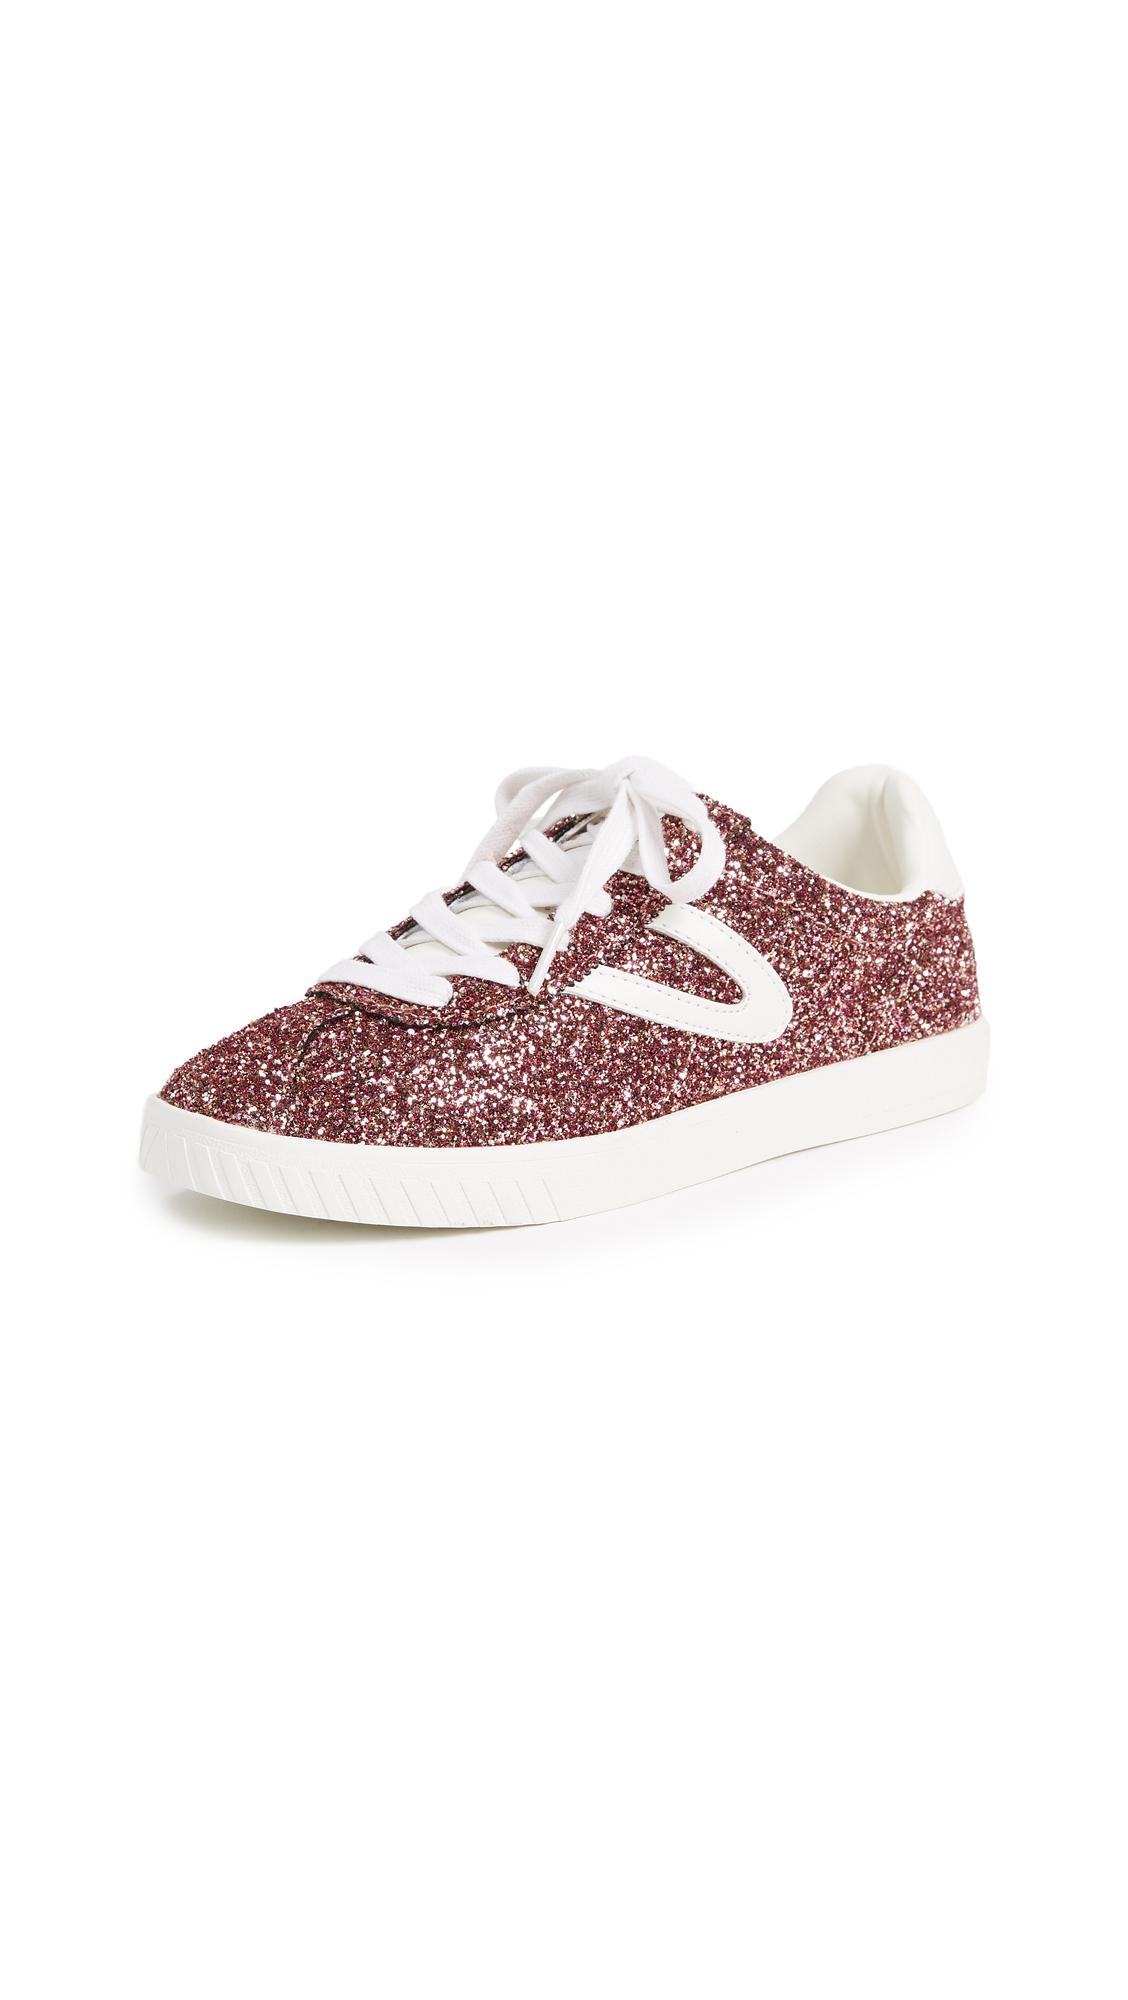 Tretorn Camden Classic Sneakers - Pink Multi/White